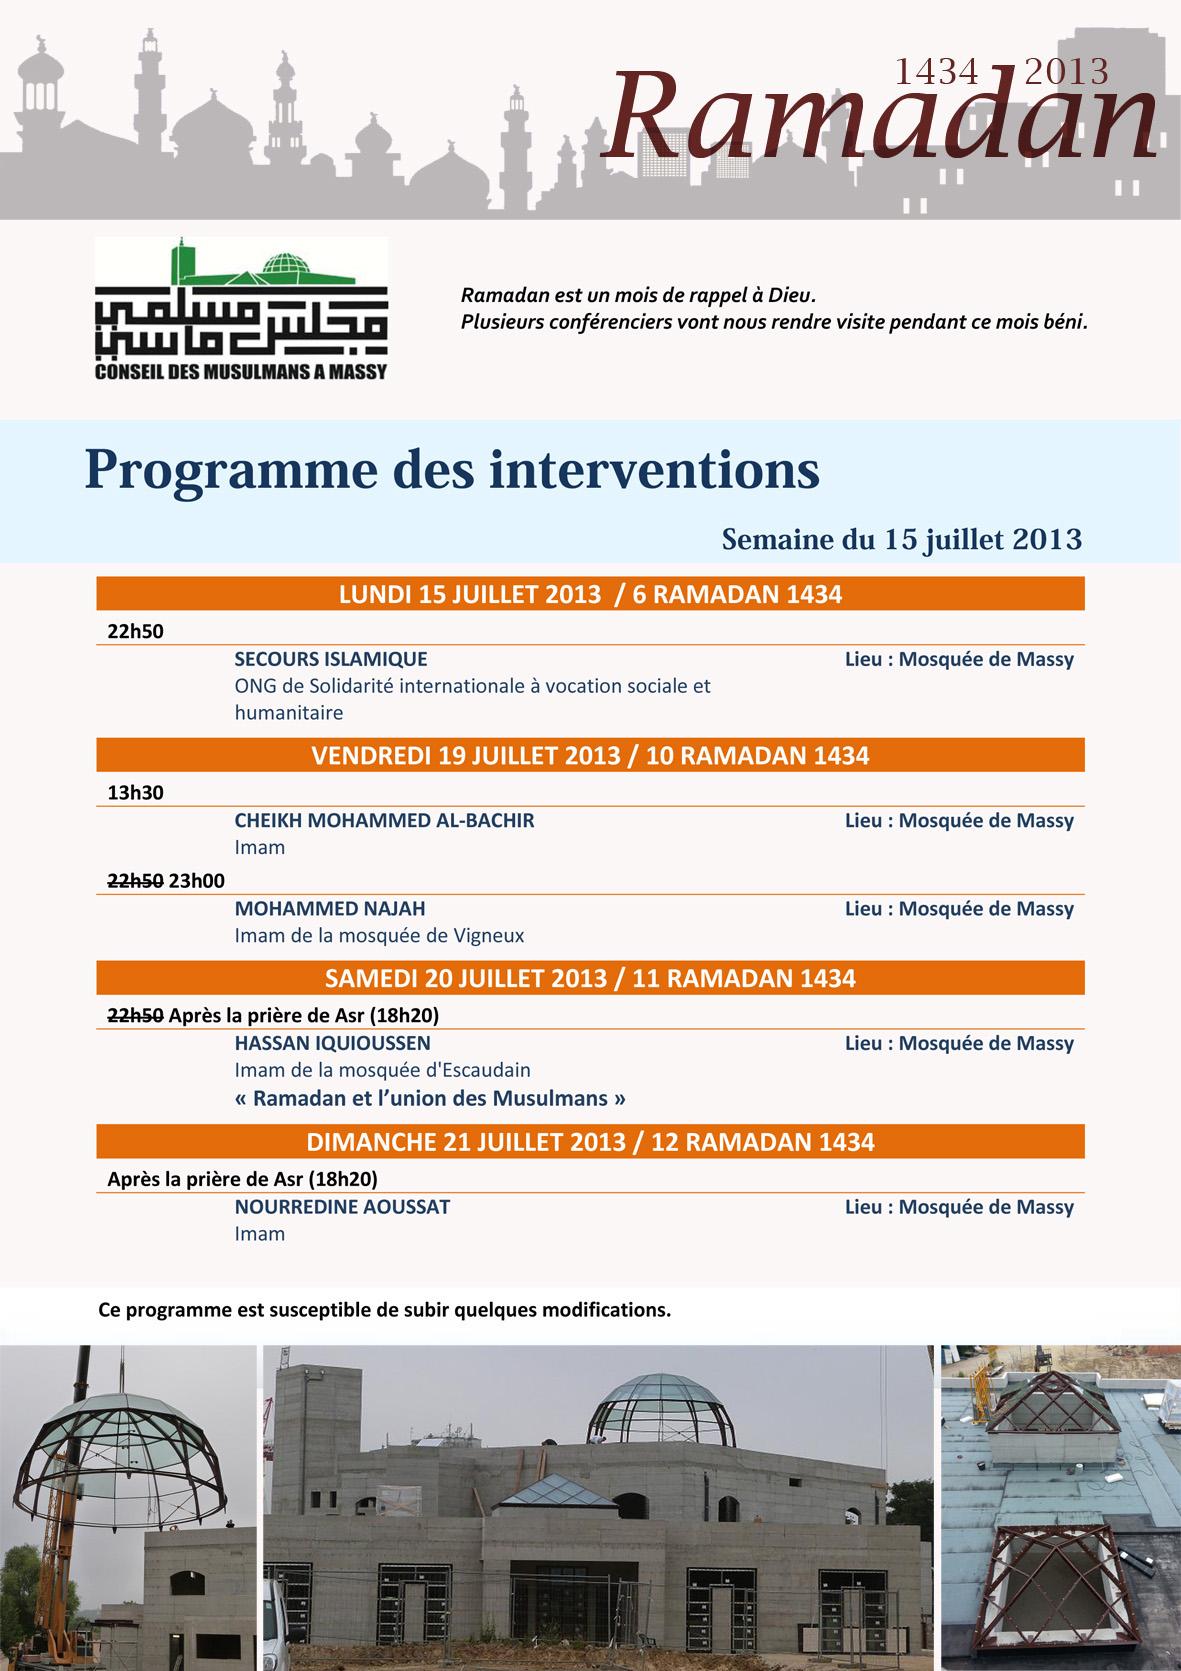 Programme des interventions - Semaine du 15 juillet 2013